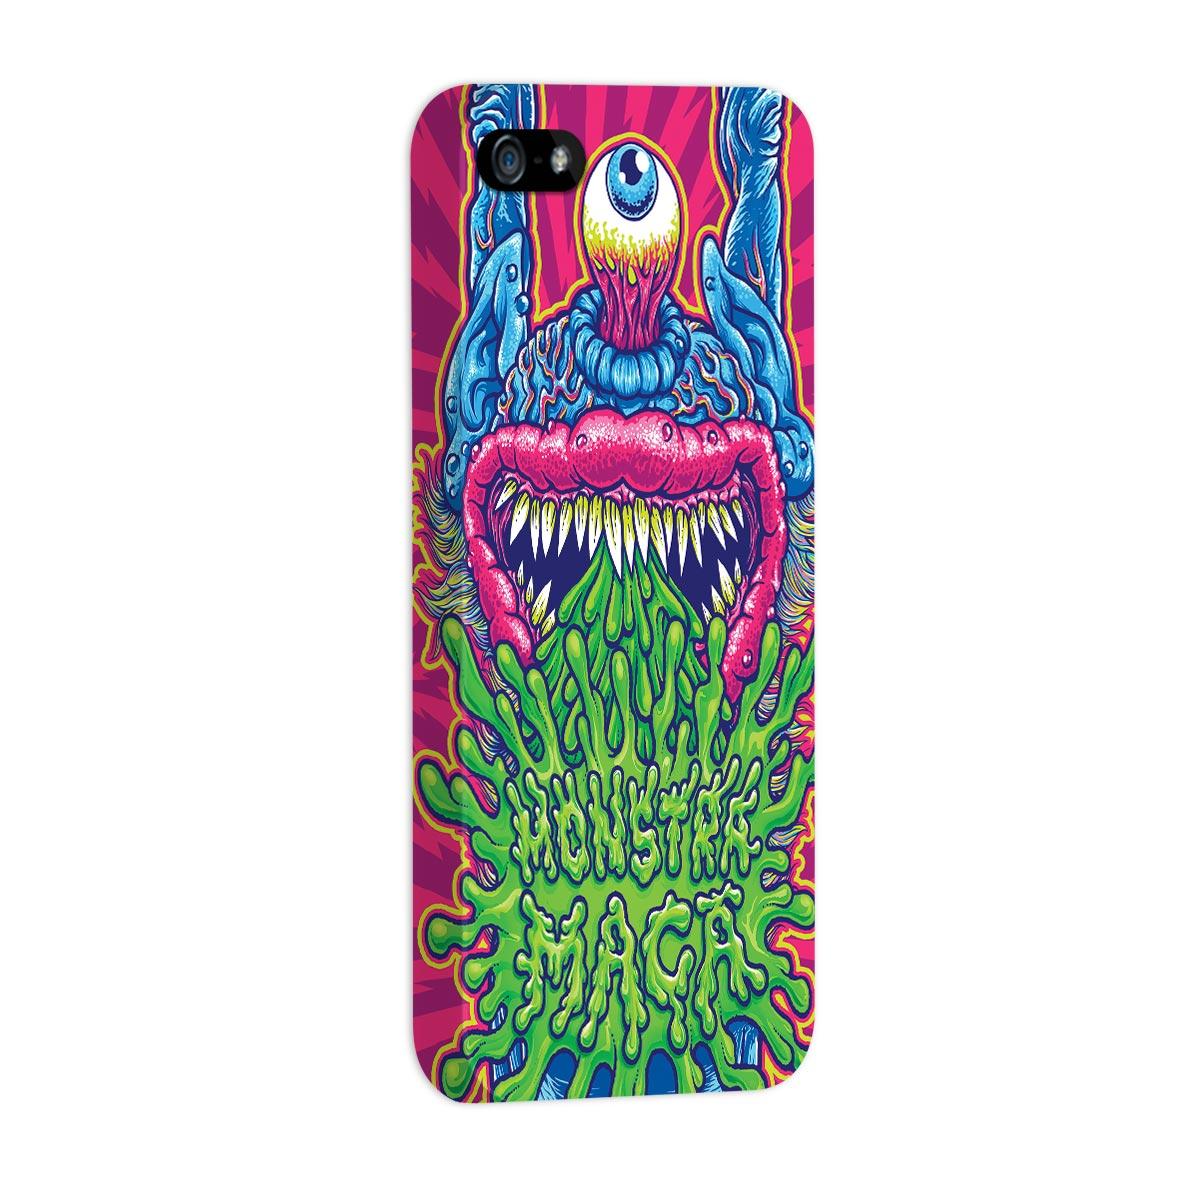 Capa para iPhone 5/5S Monstra Maçã Puke